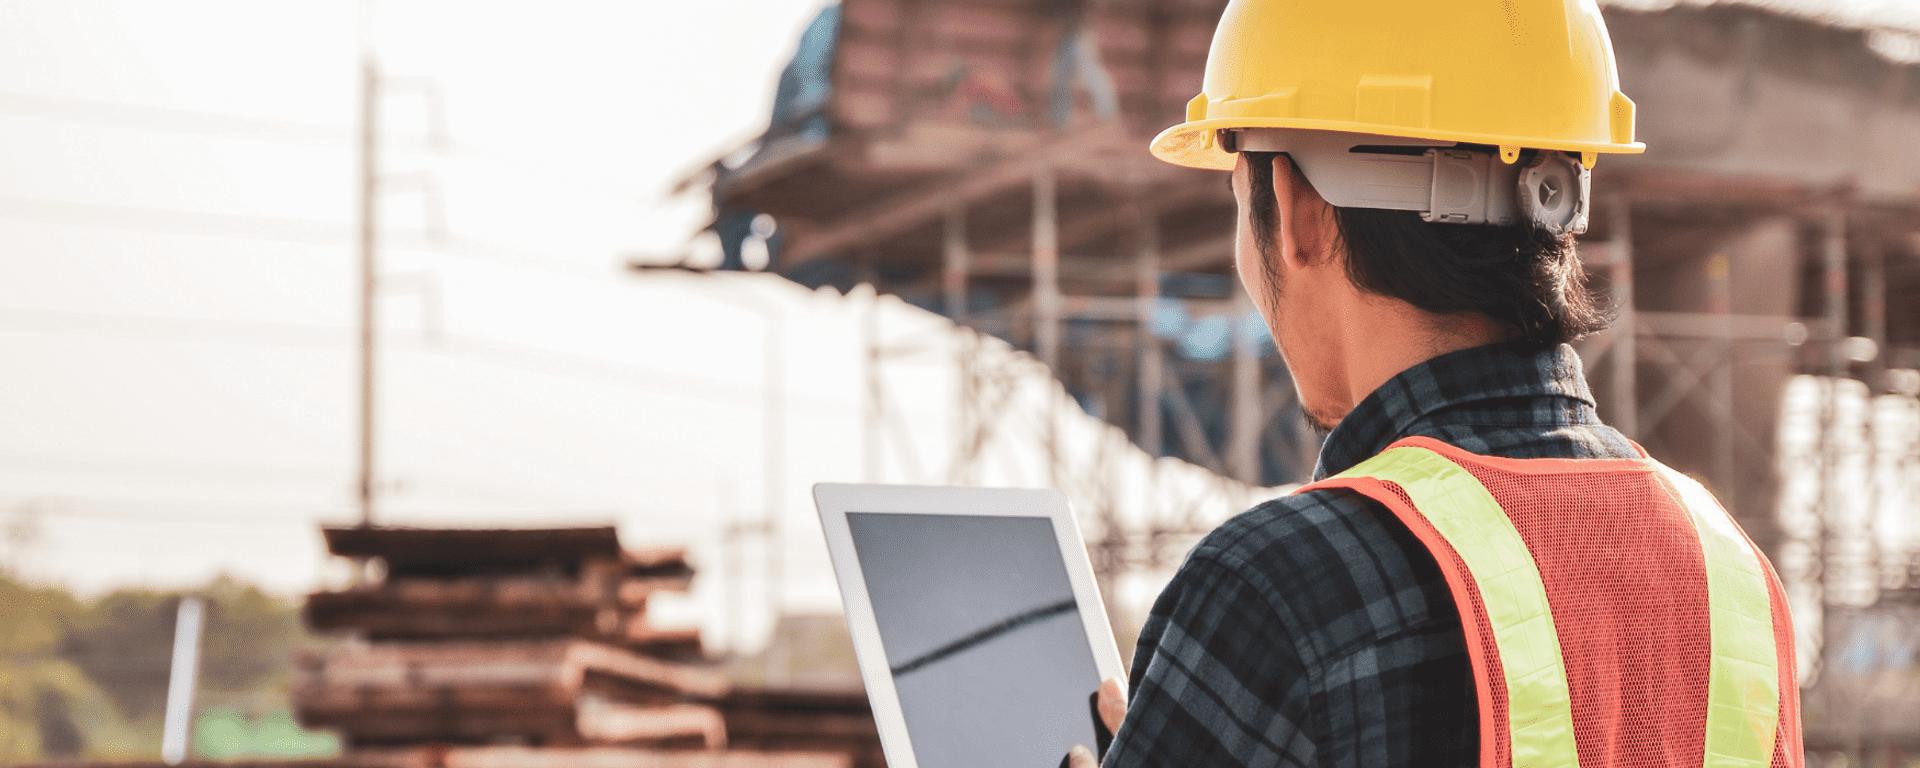 Accruent - Resources - Webinars - Enabling Remote Maintenance Work - Hero